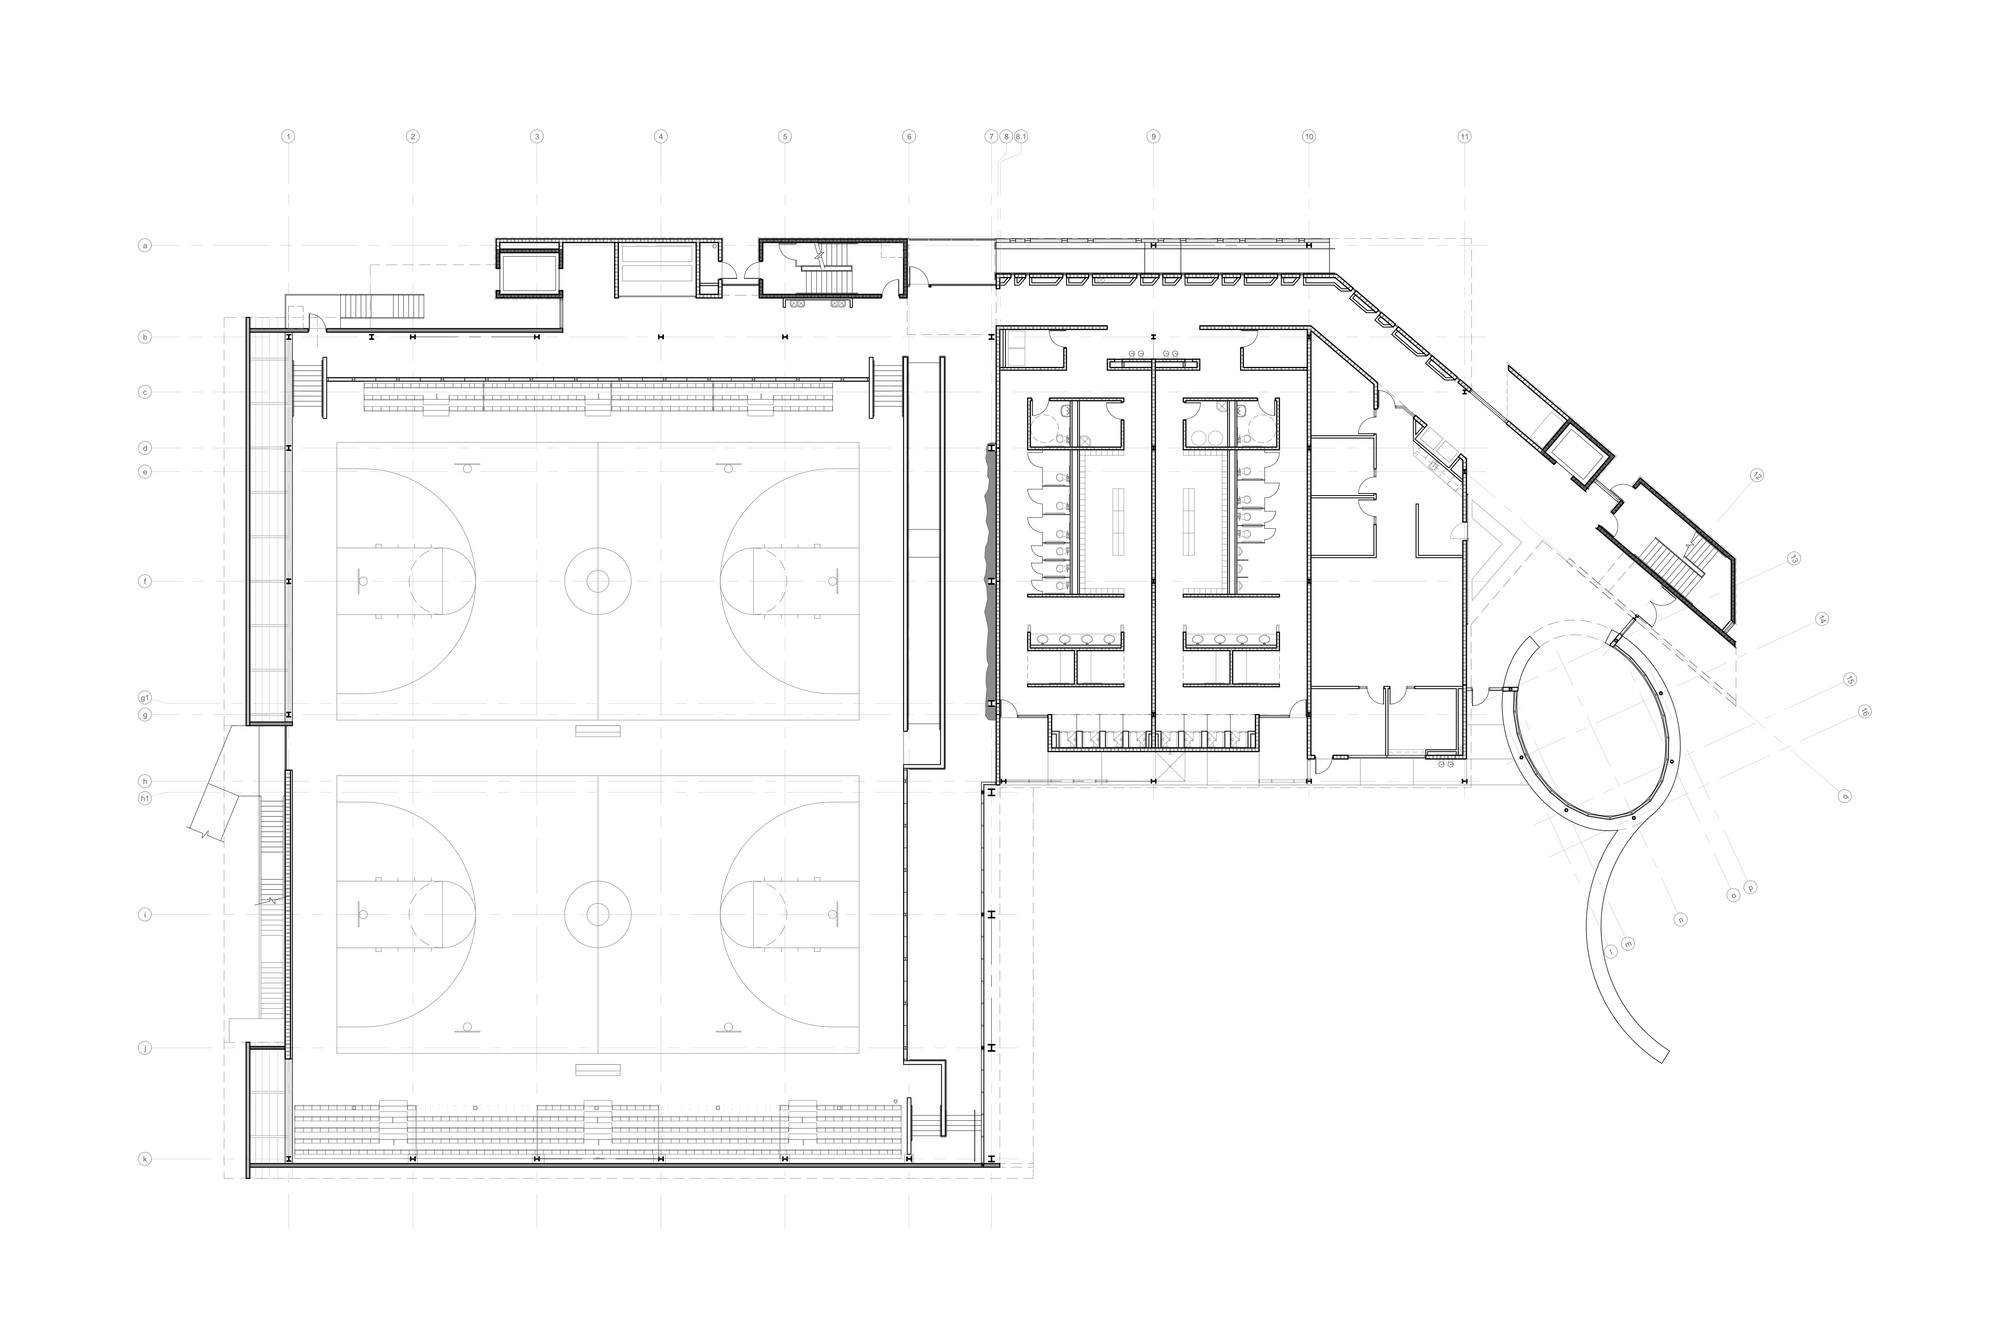 Sport and fitness center for disabled people baldinger for Fitness center floor plan